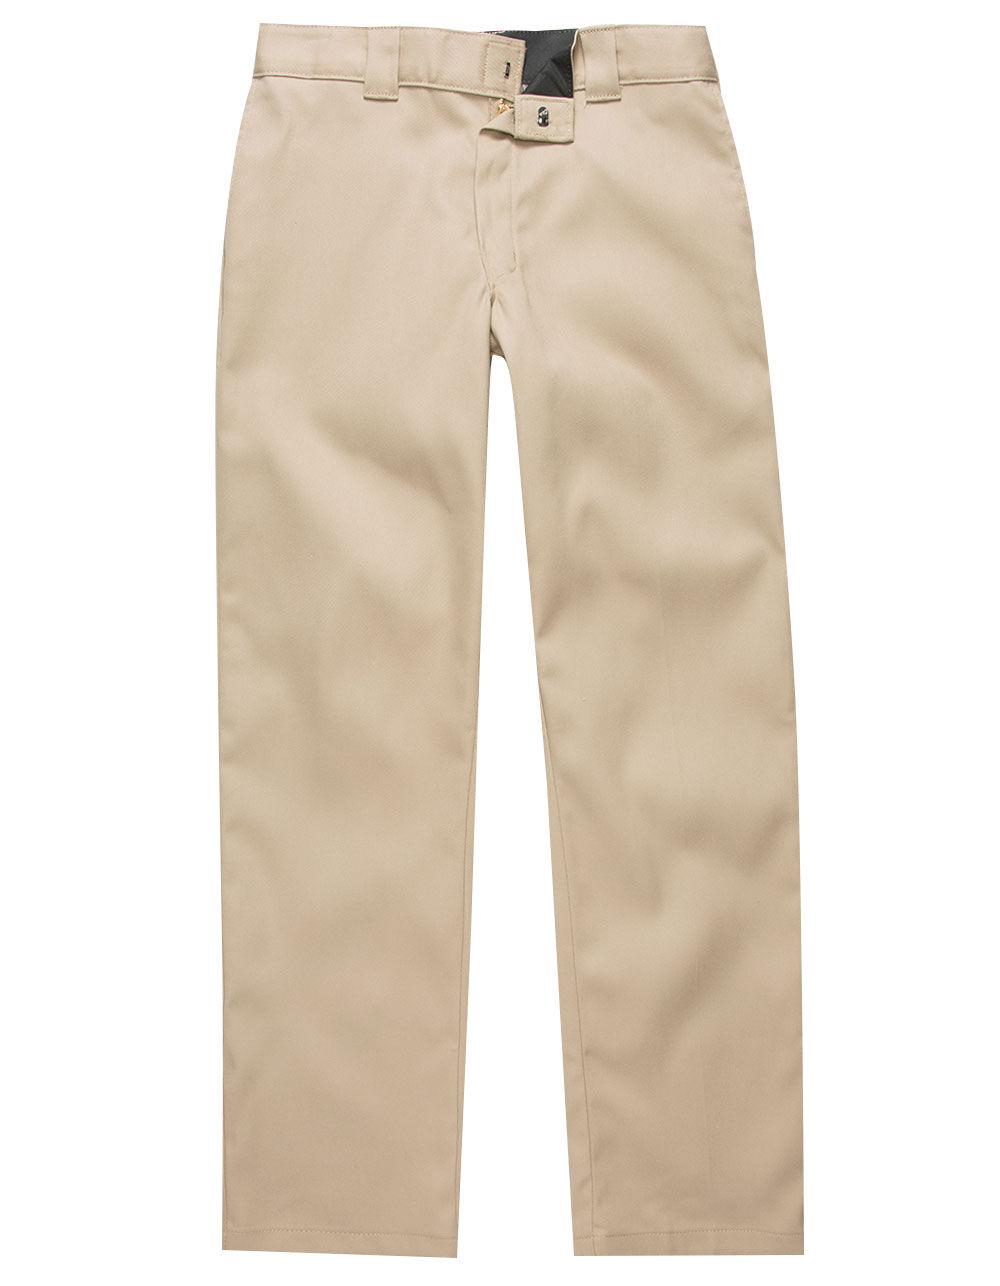 DICKIES 874 FLEX ORIGINAL FIT PANTS